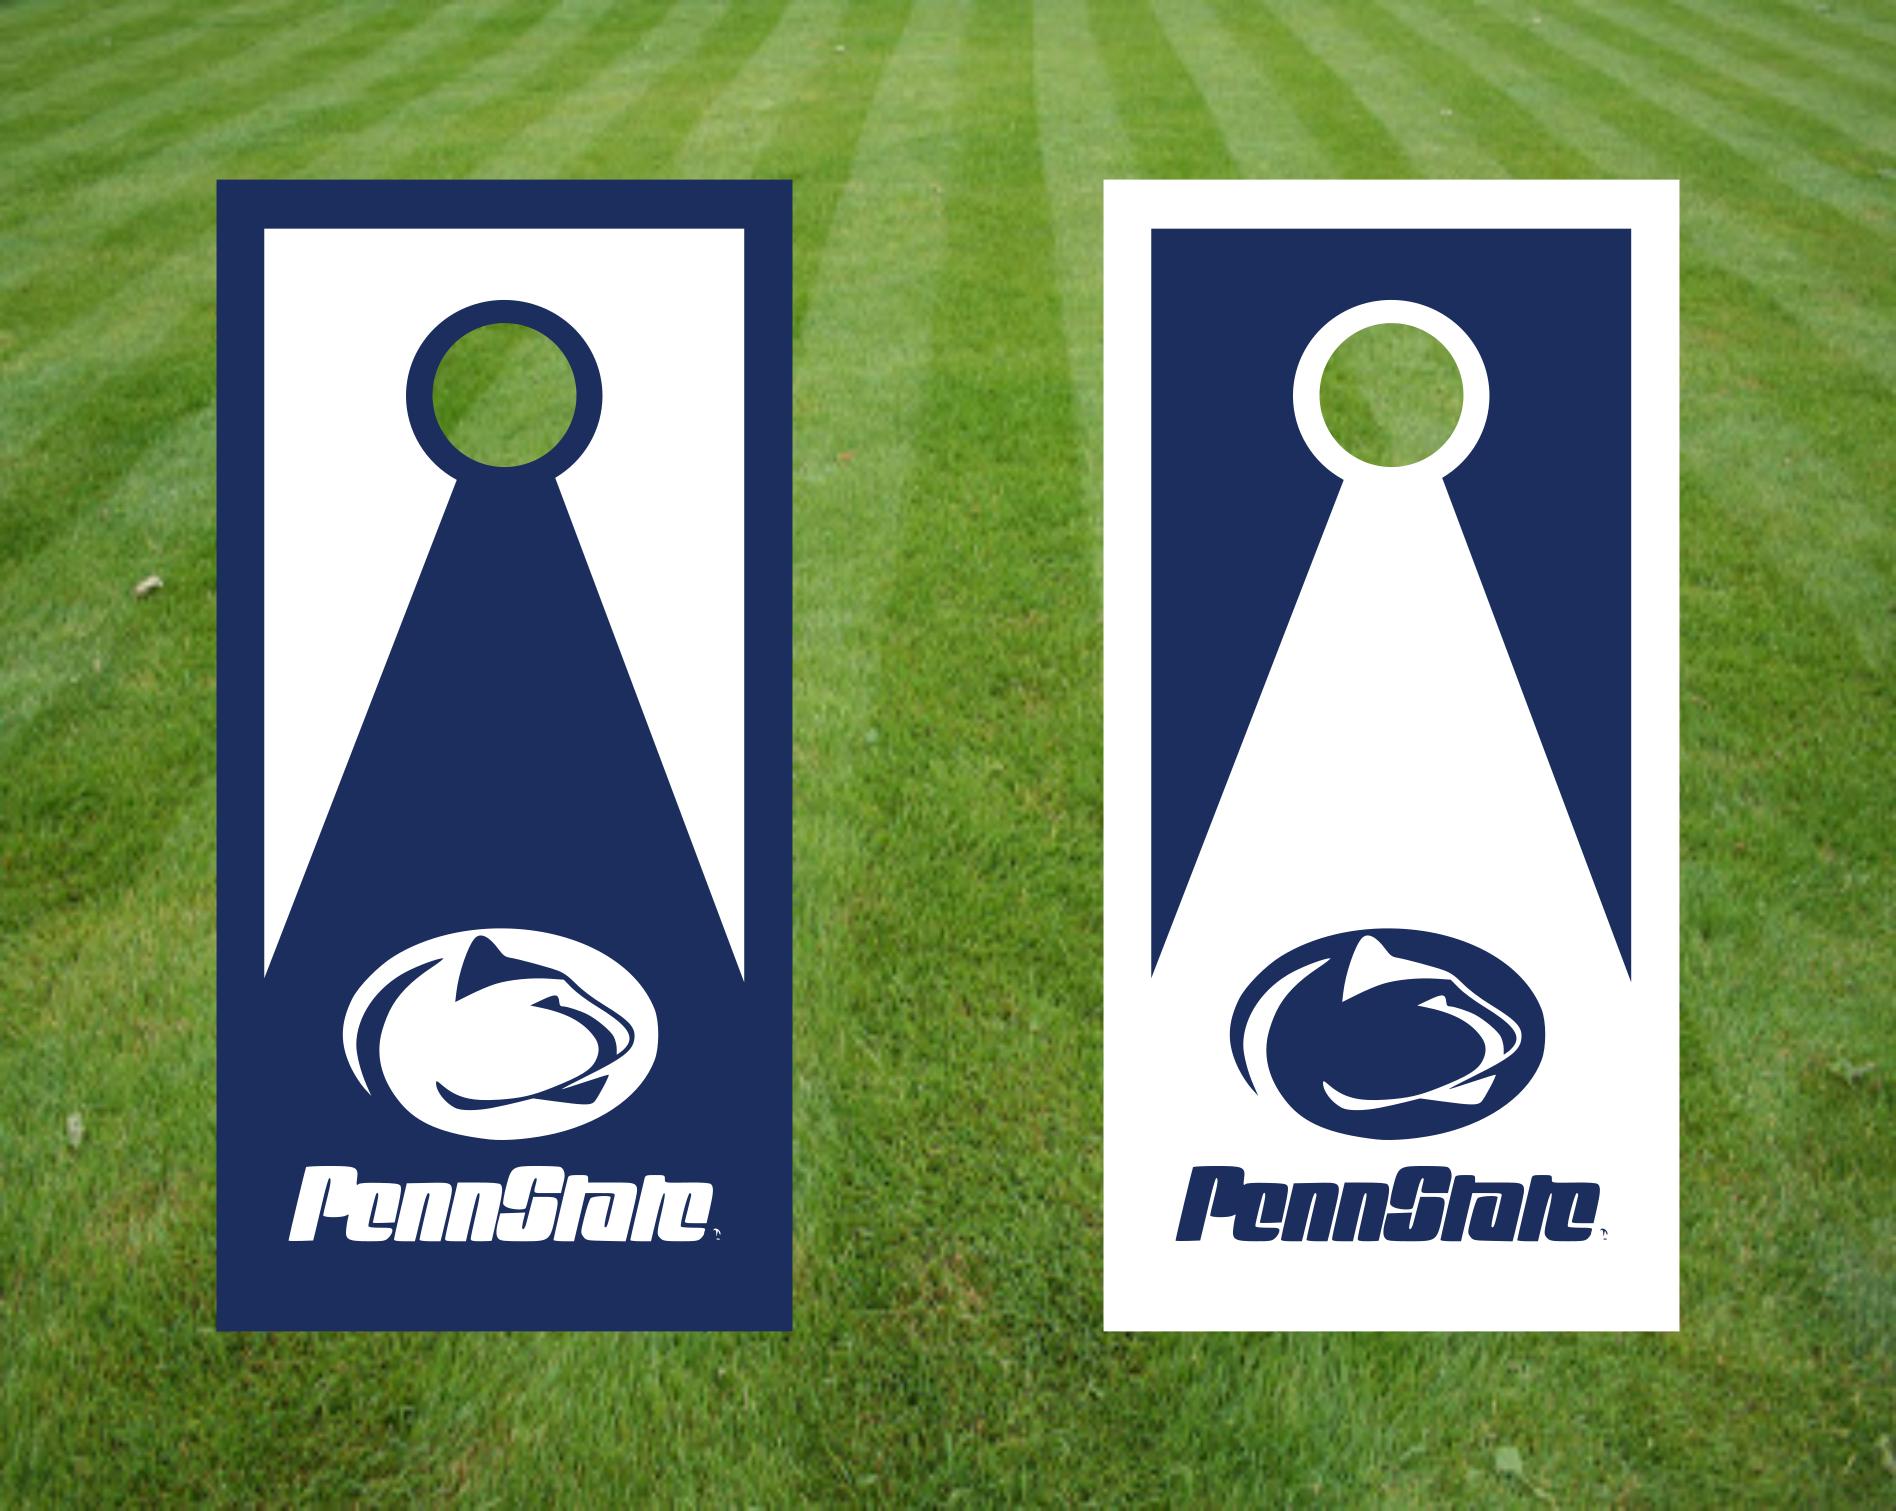 Penn State Logo Corn Hole Board Decals Easy Install Guarantee Set Ebay Cornhole Board Decals Cornhole Decals Cornhole Boards [ 1511 x 1896 Pixel ]